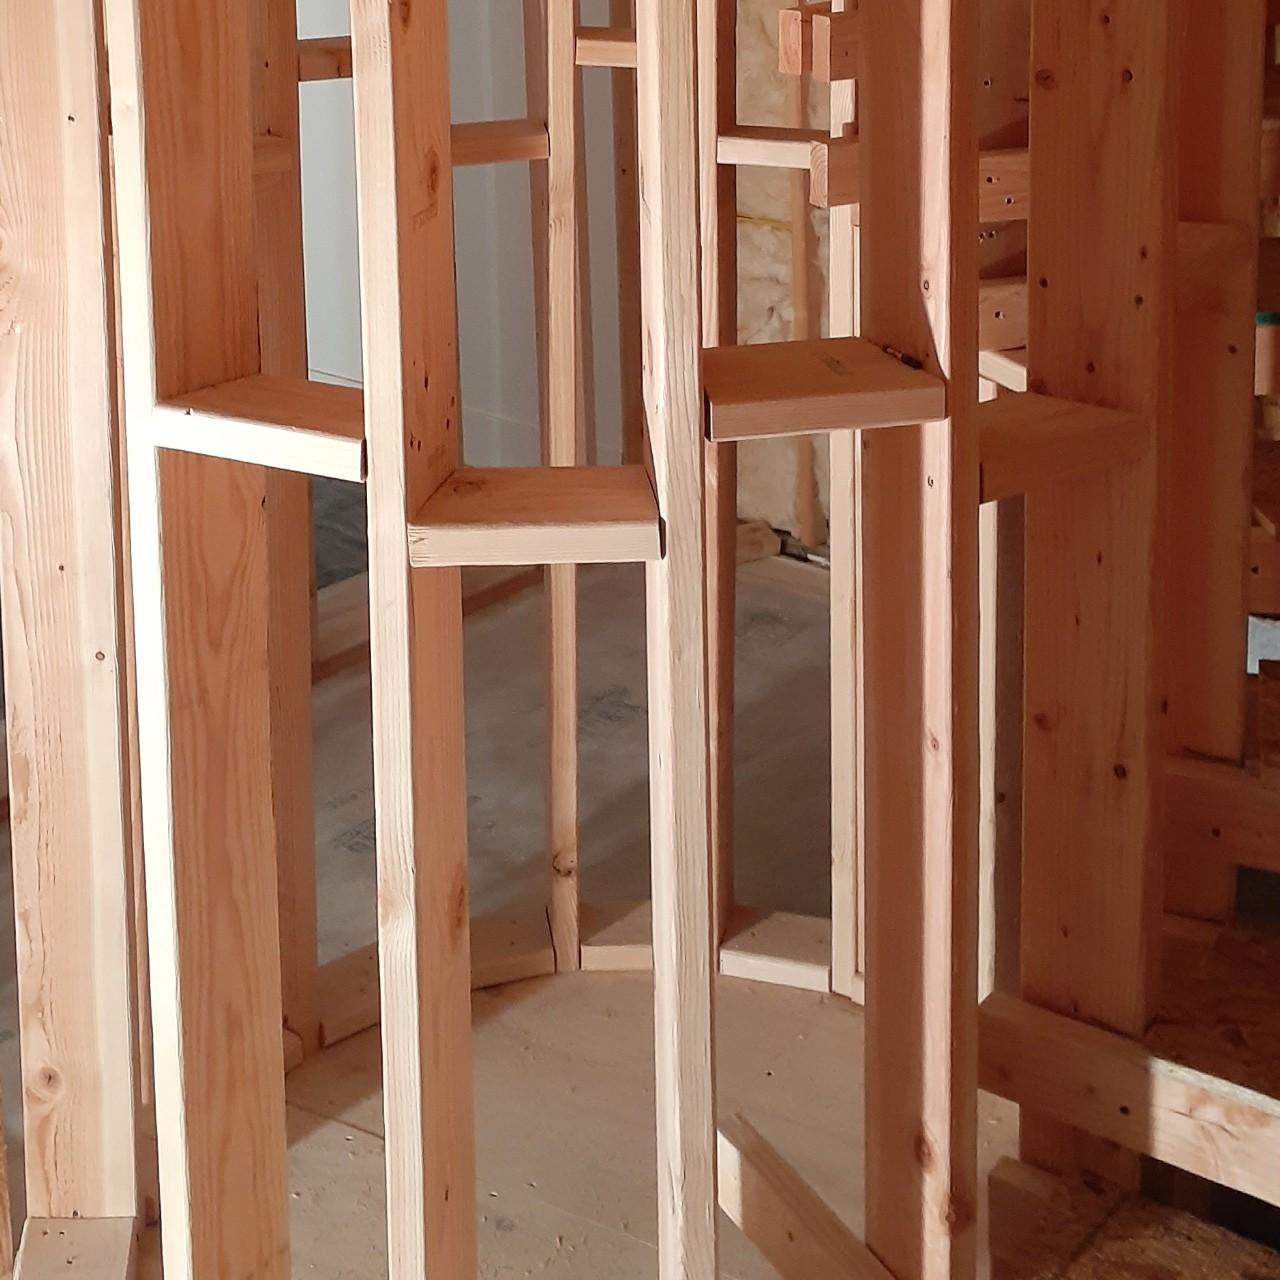 carpentry-wood-framing-second-floor-home-addition--framing-24